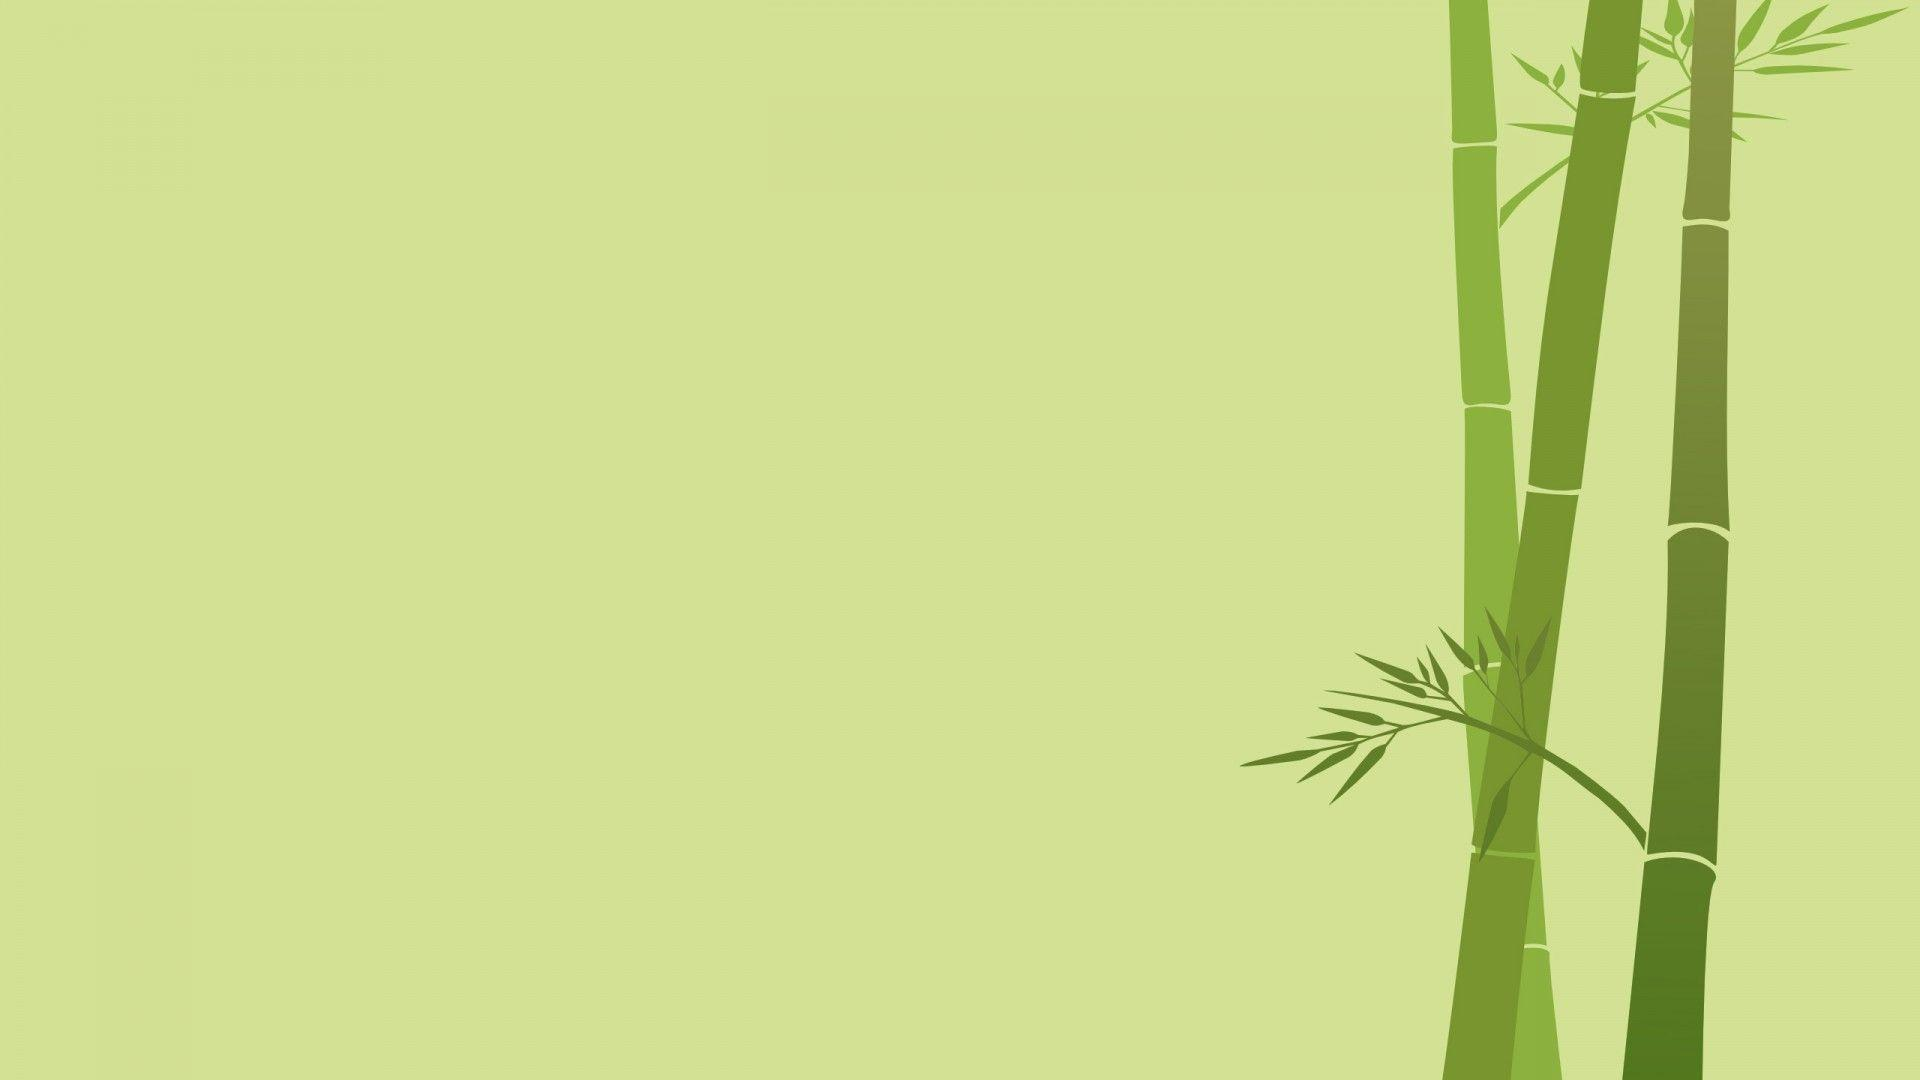 Bamboo Desktop Wallpapers - Wallpaper Cave